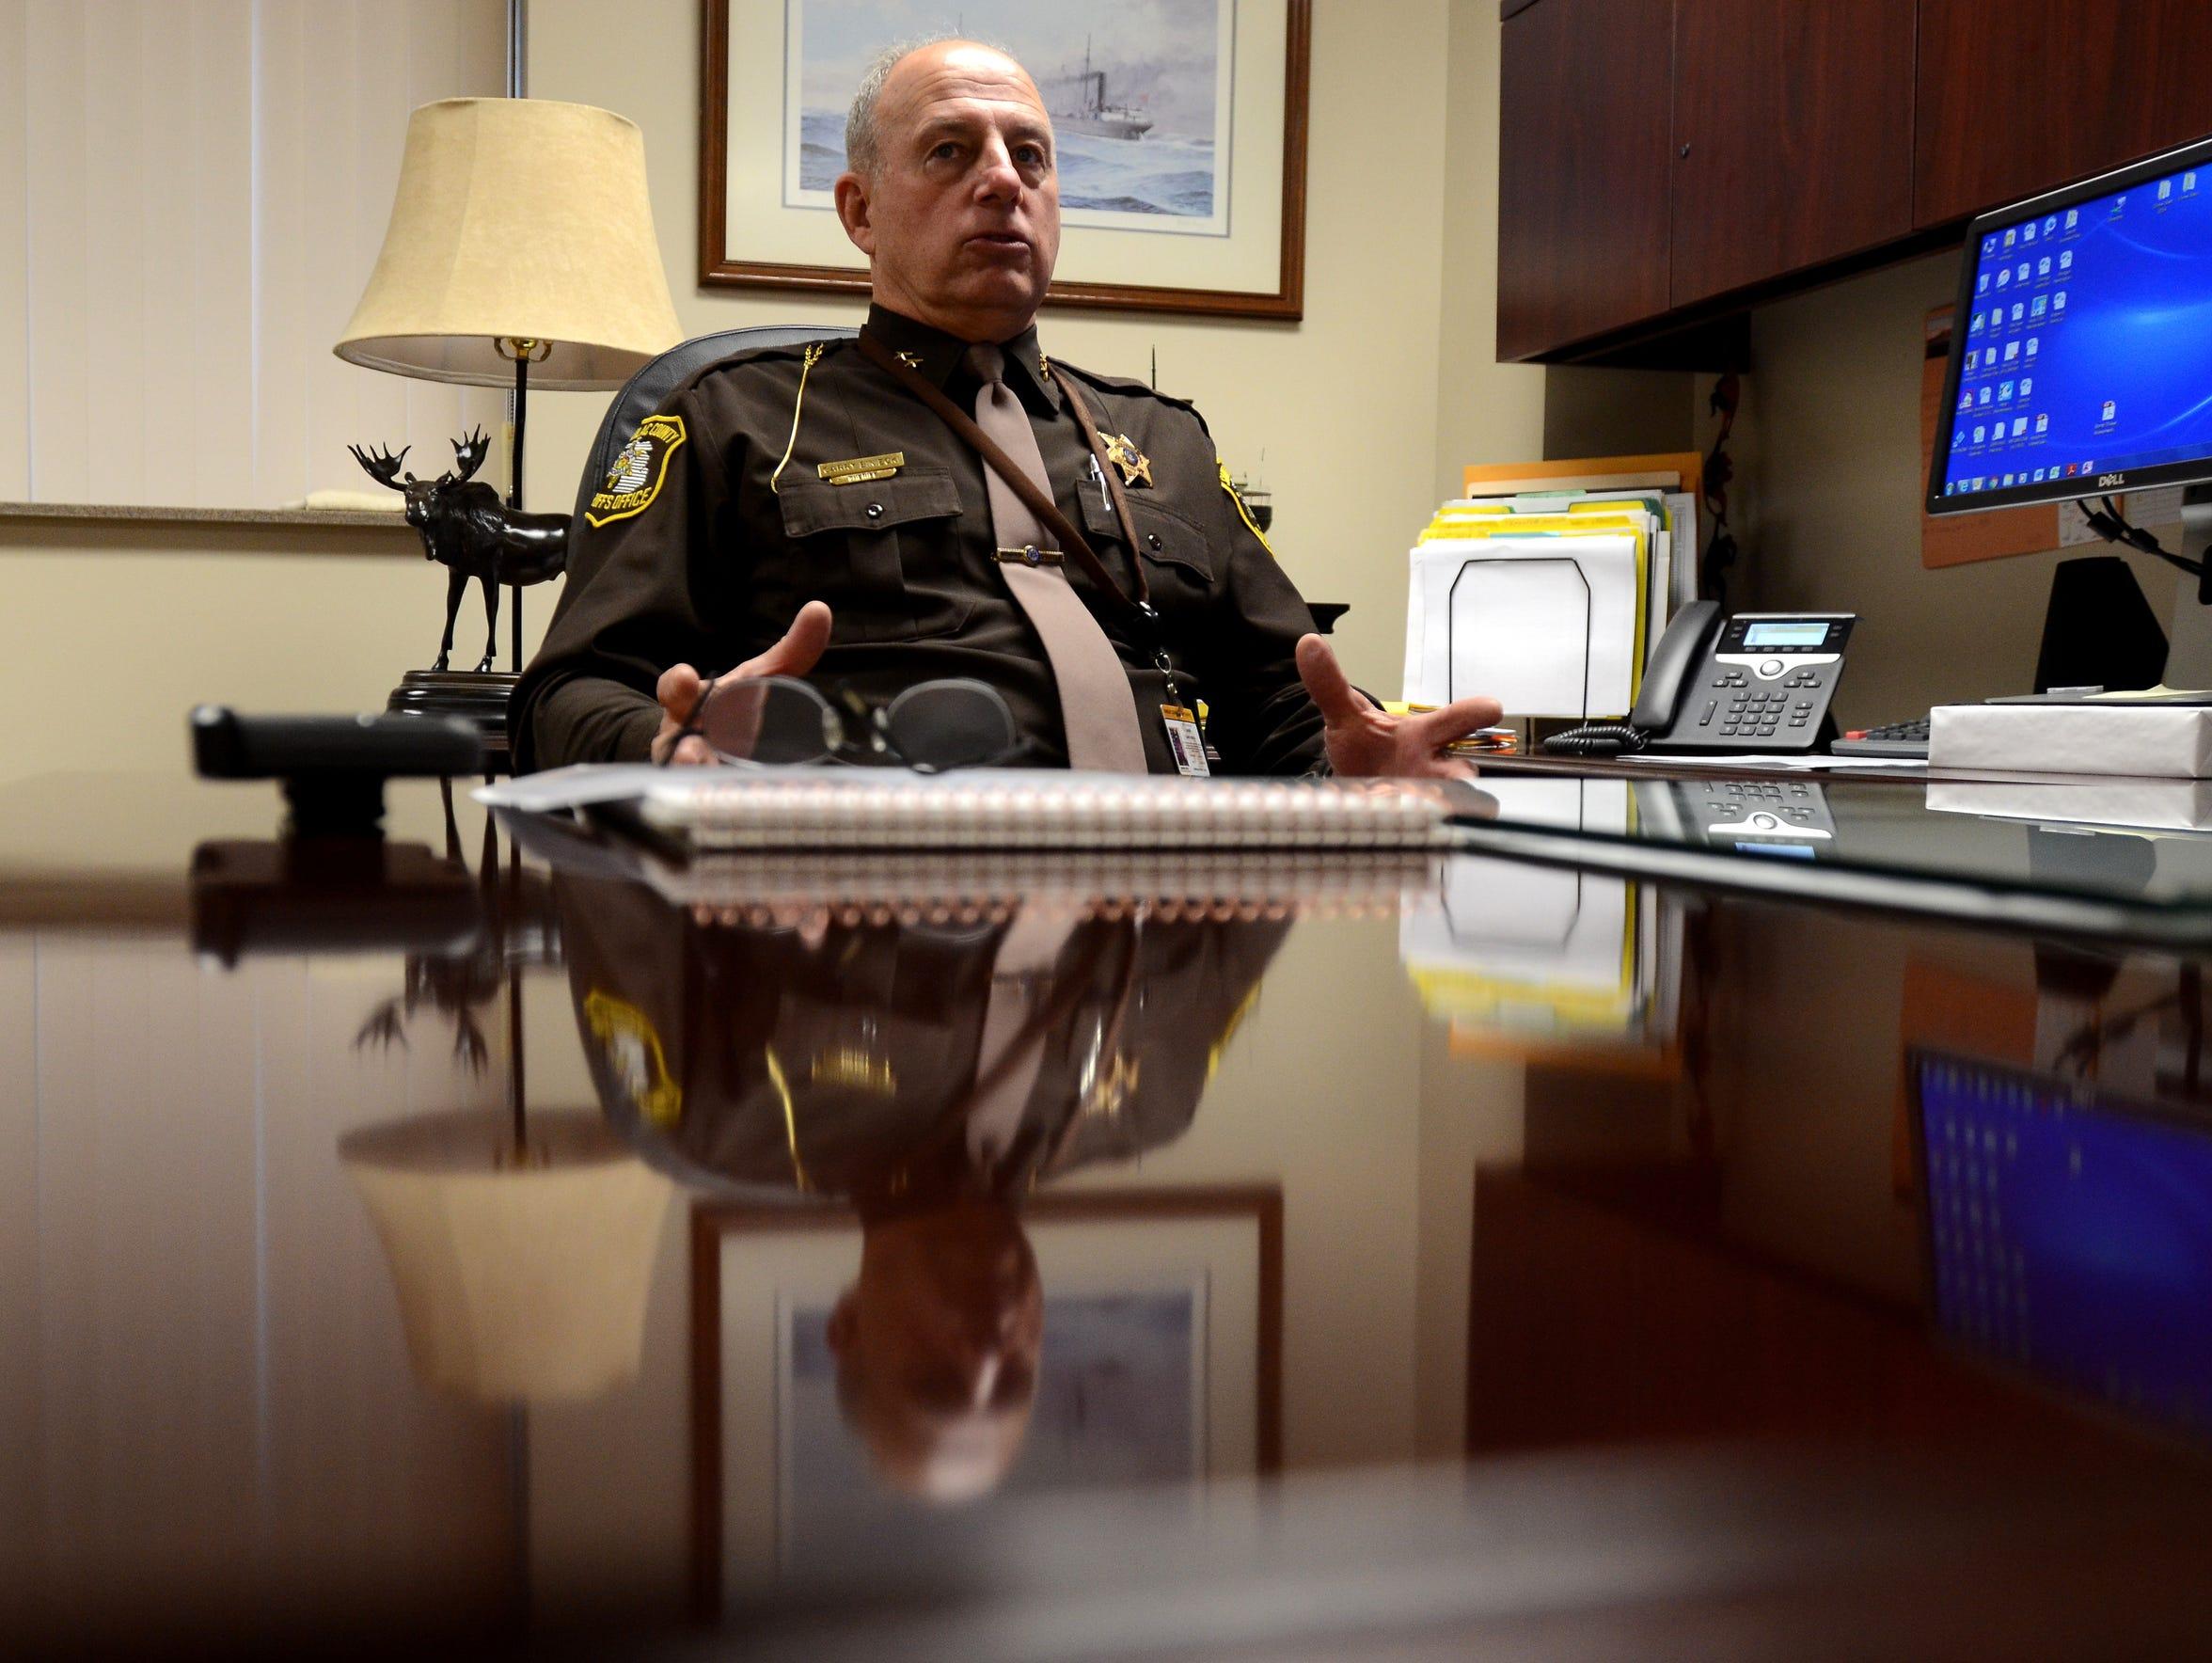 Sanilac County Sheriff Garry Biniecki talks about the